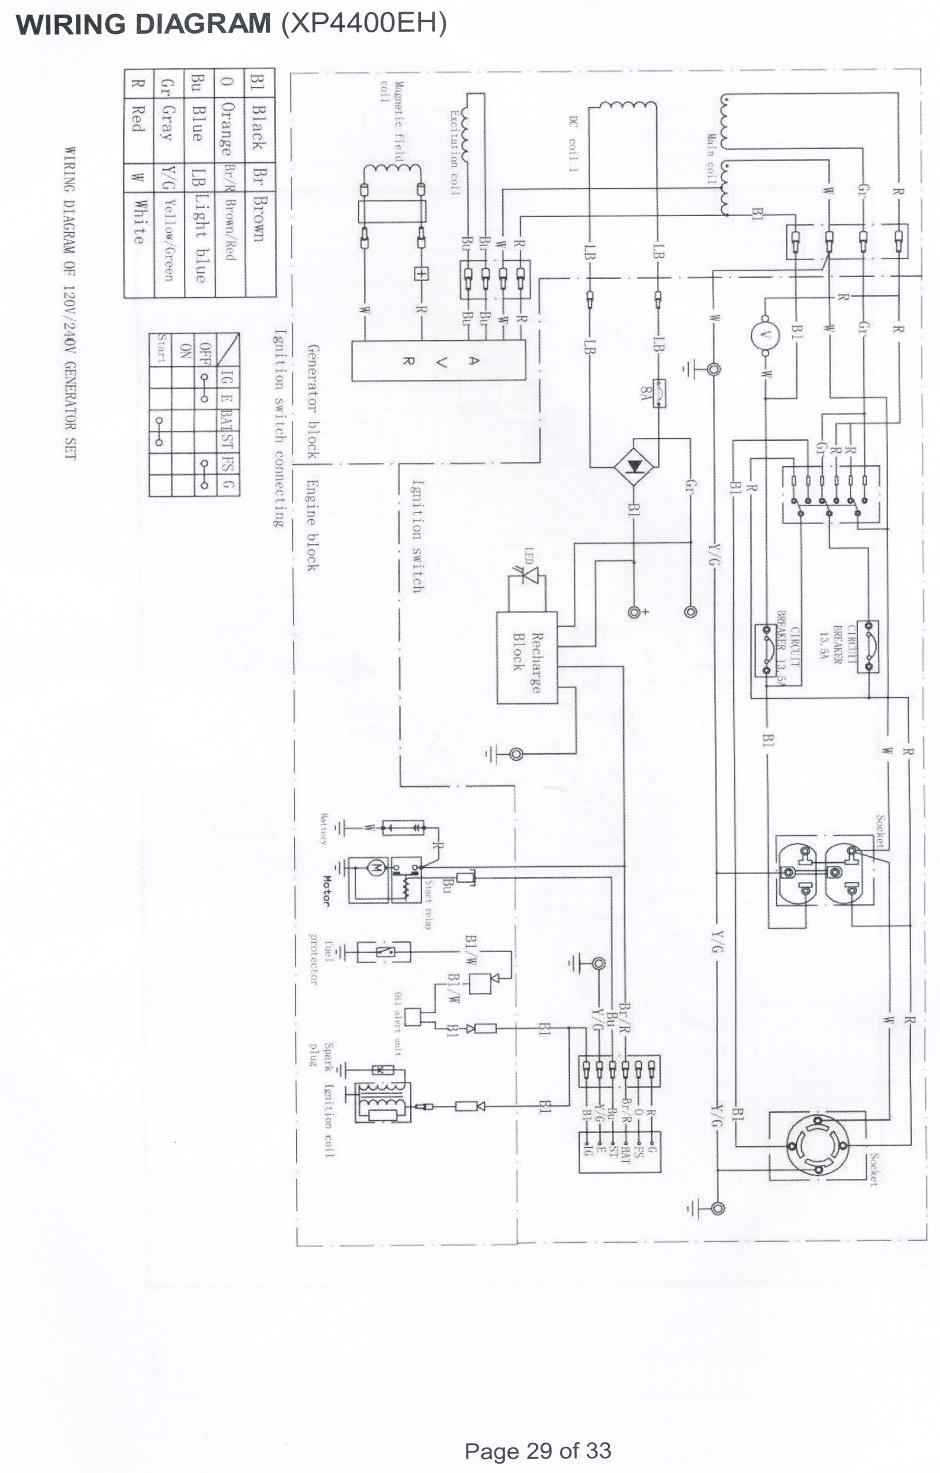 duromax generator wiring diagram auto electrical wiring diagram u2022 rh 6weeks co uk